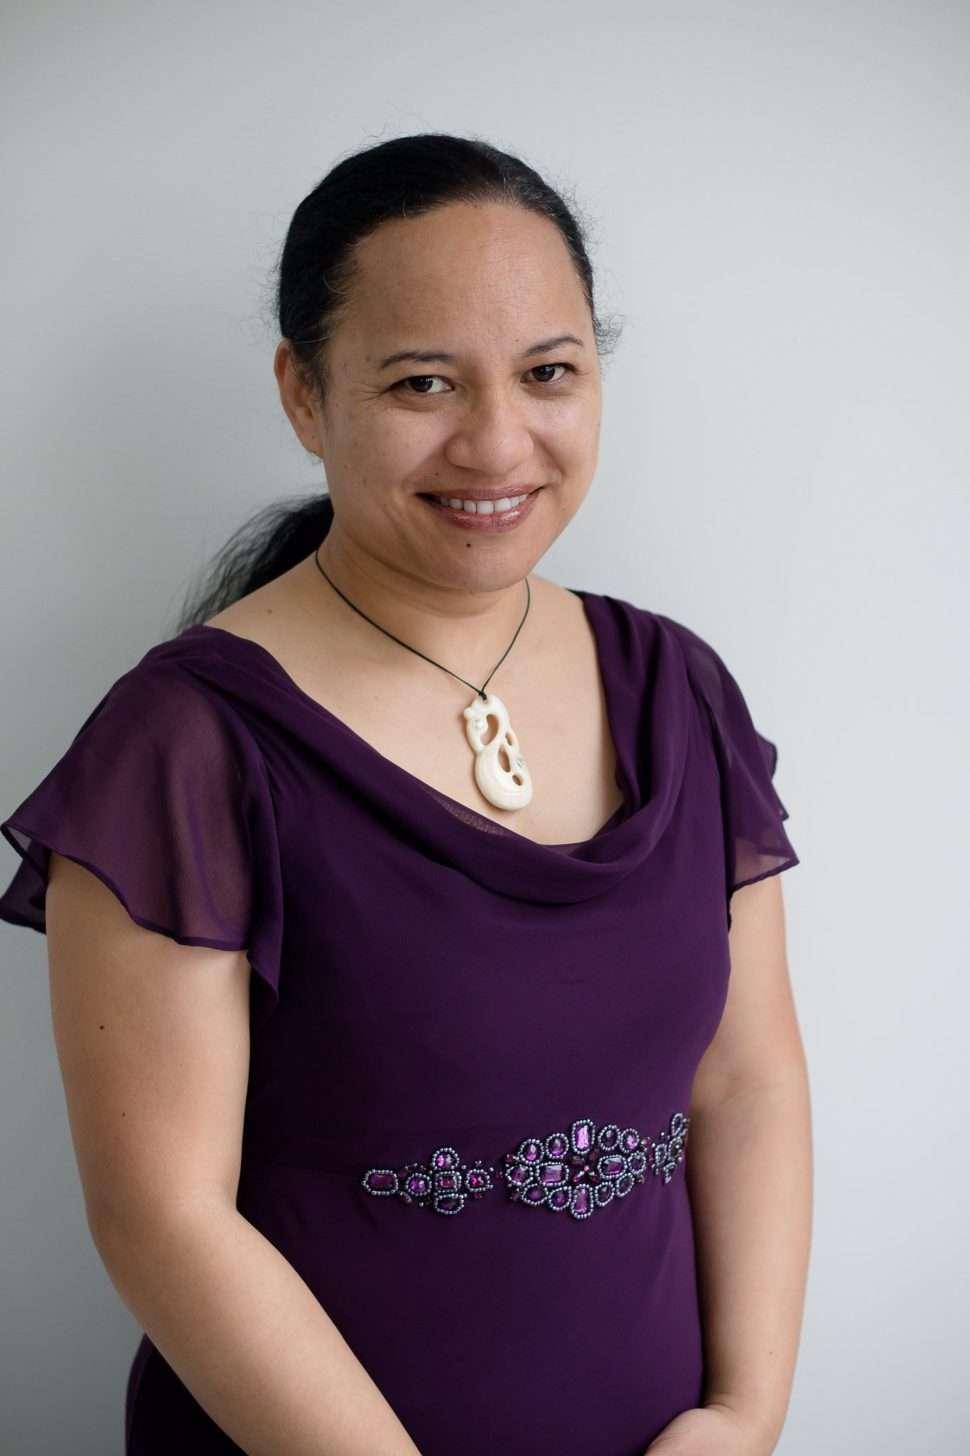 Adele Hauwai